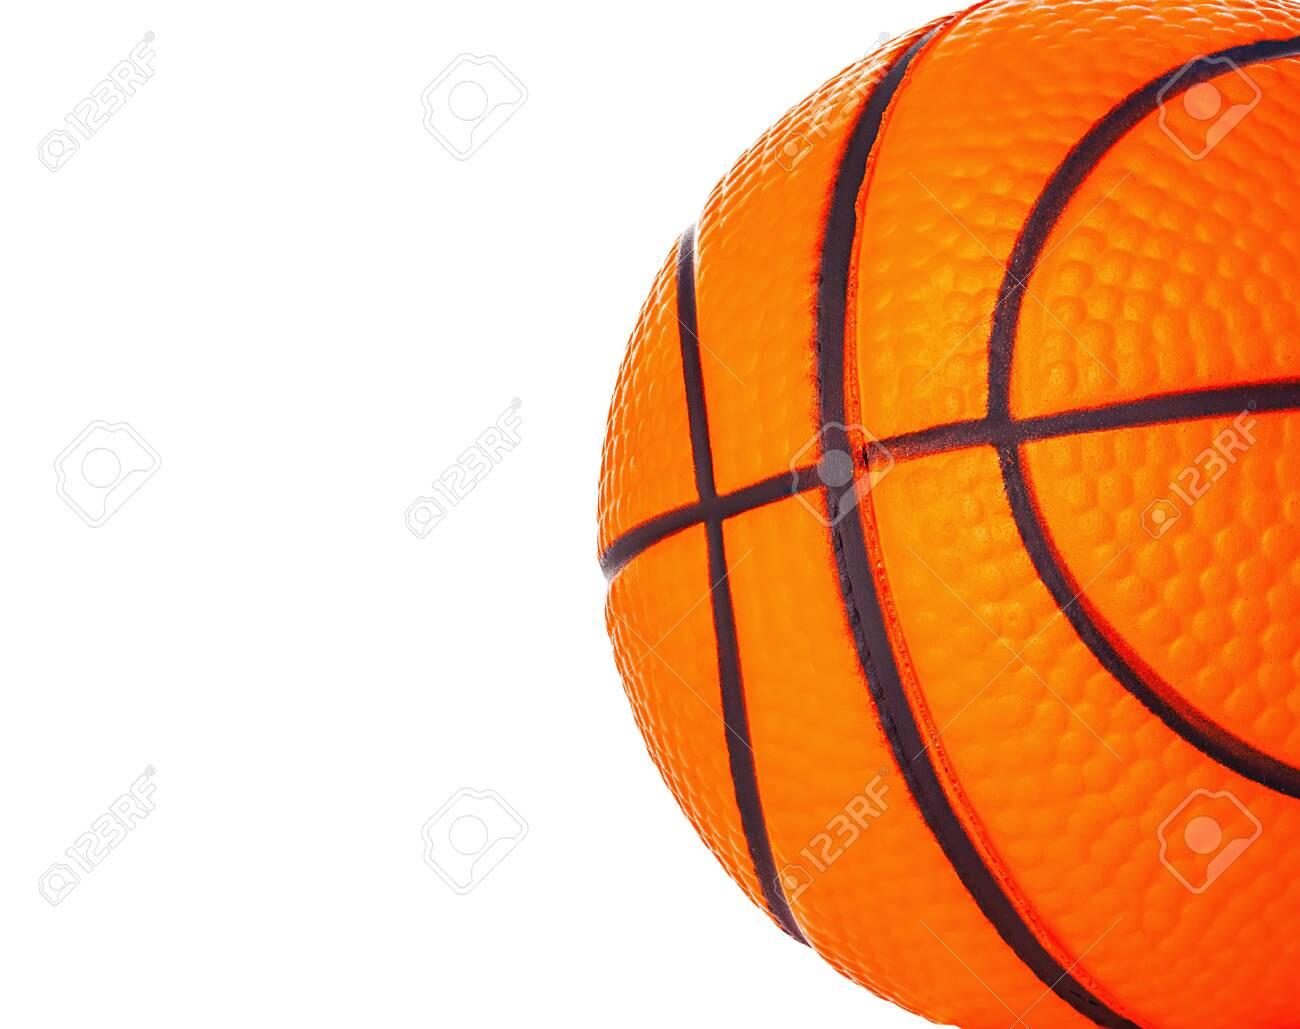 Orange basket ball close-up as a background. - 126197355